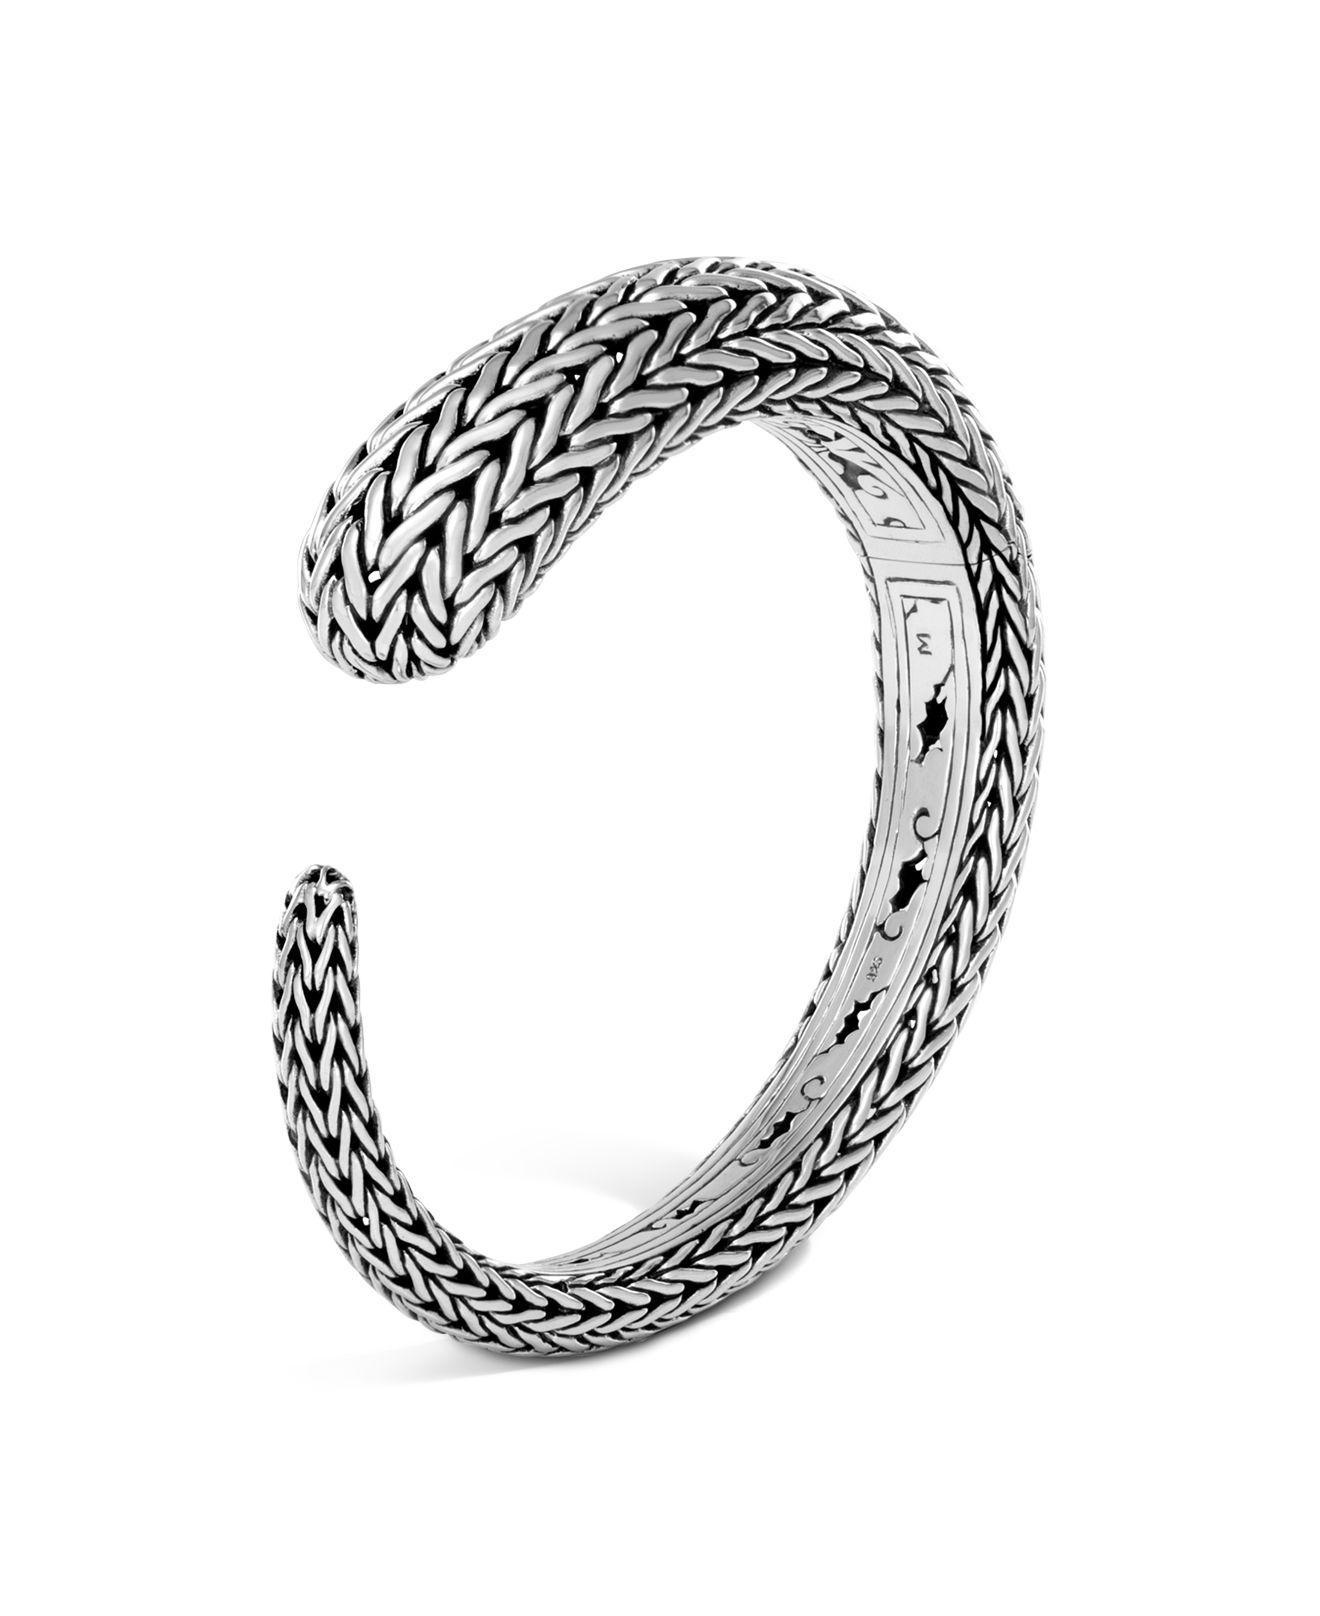 John Hardy Classic Chain Wave Kick Cuff Bracelet frcossA8o7